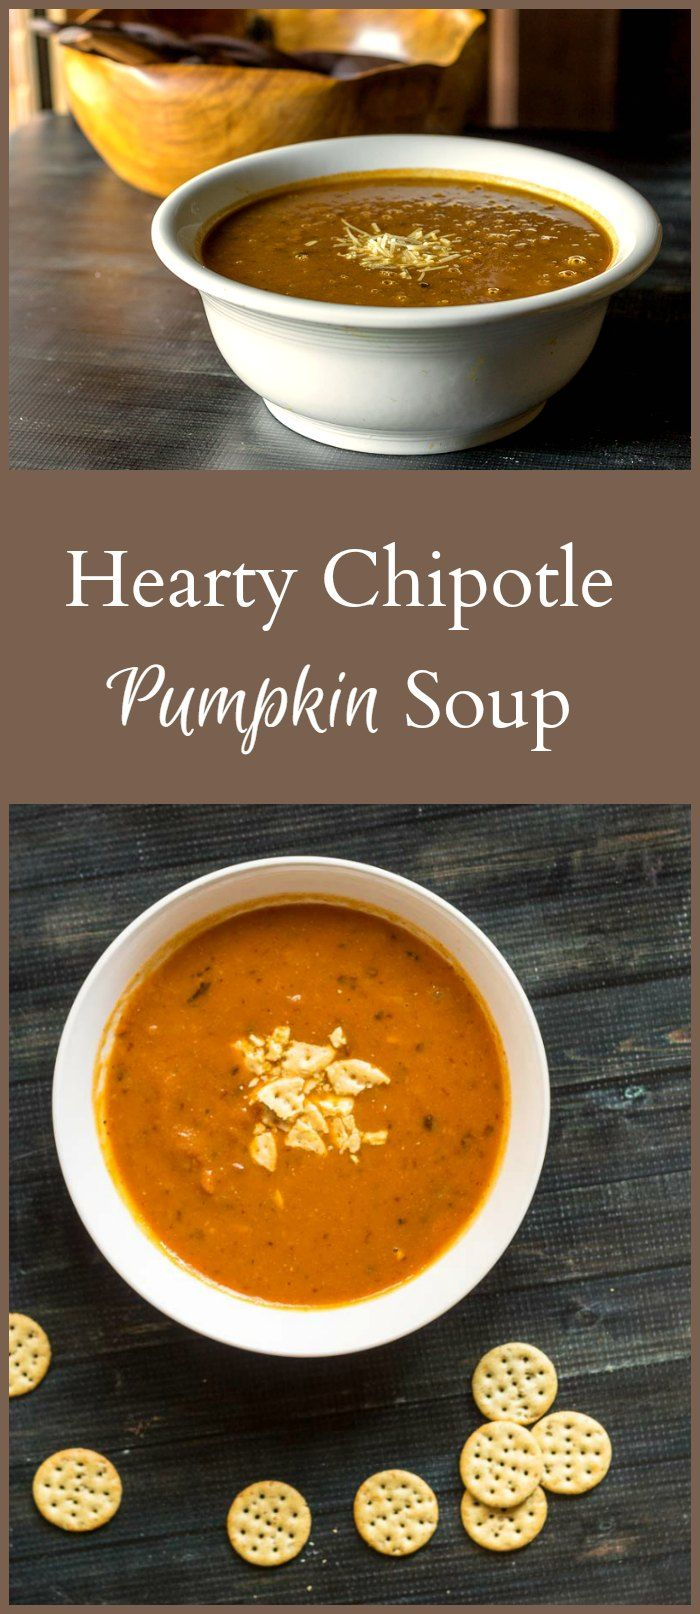 466 best Comfort Food   Soups. Stews. images on Pinterest ...